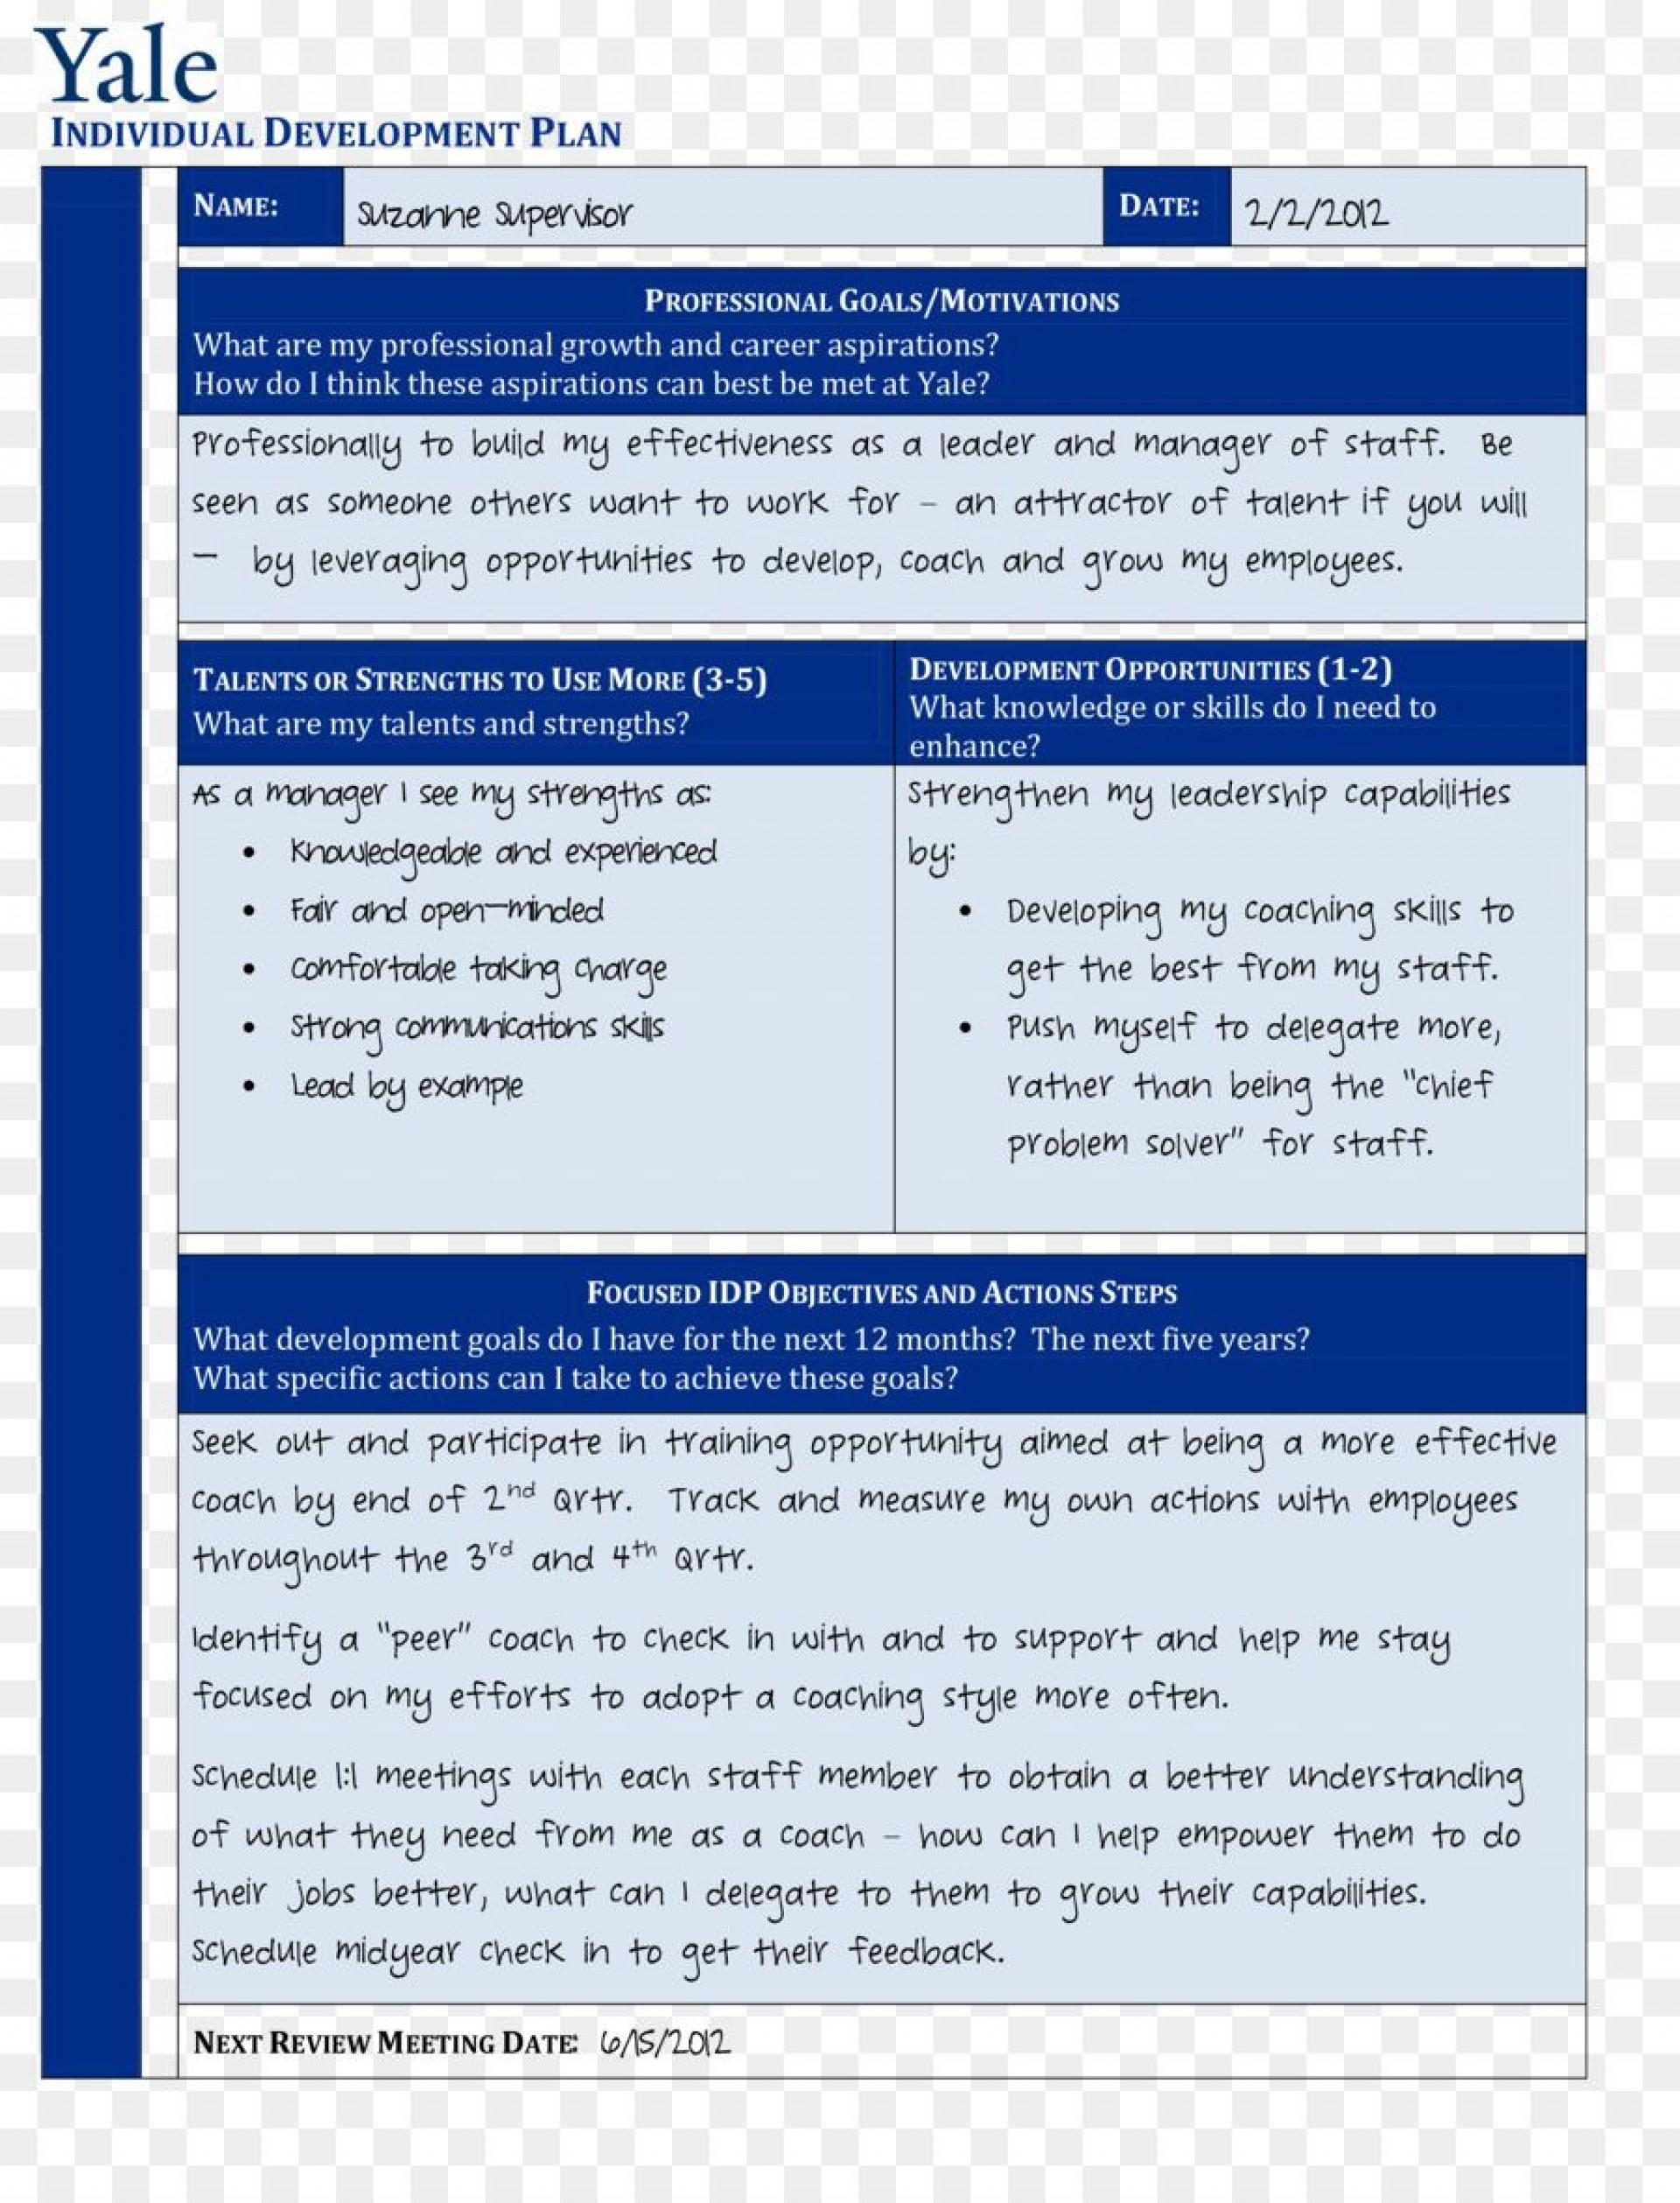 001 Imposing Professional Development Plan Template Pdf Highest Clarity  Sample Example1920